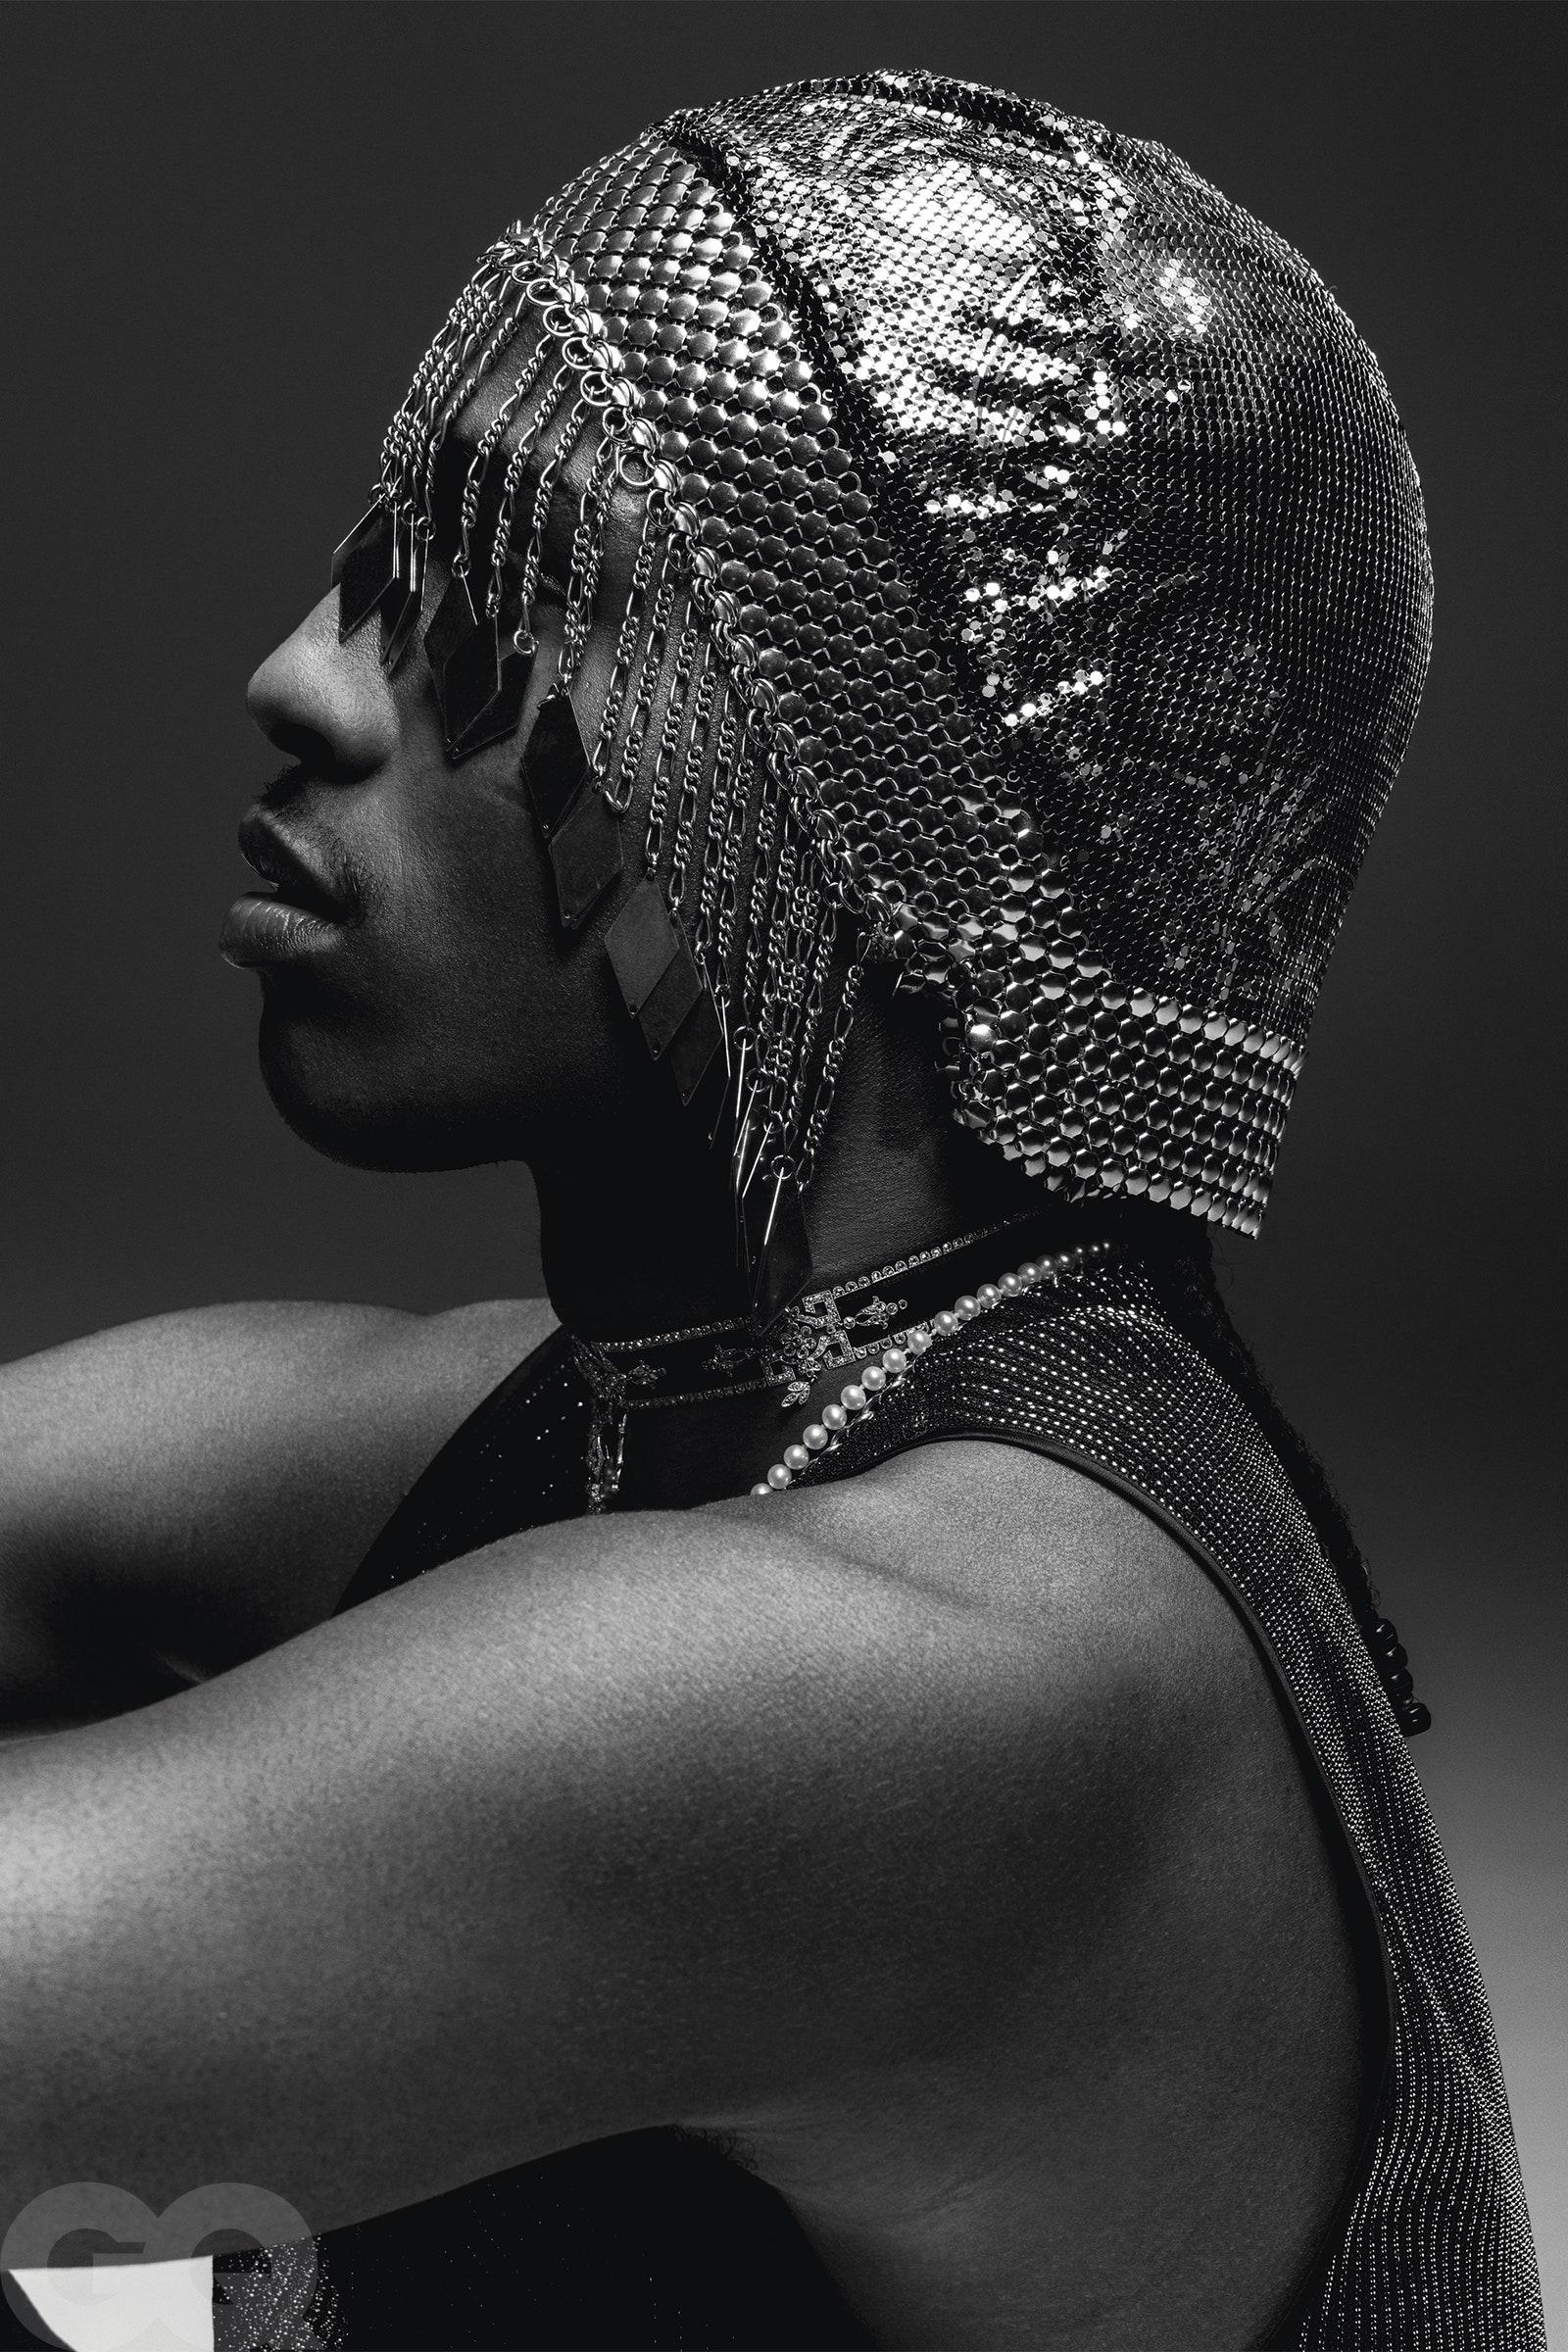 ASAP Rocky All Smiles Album Rihanna GQ Story